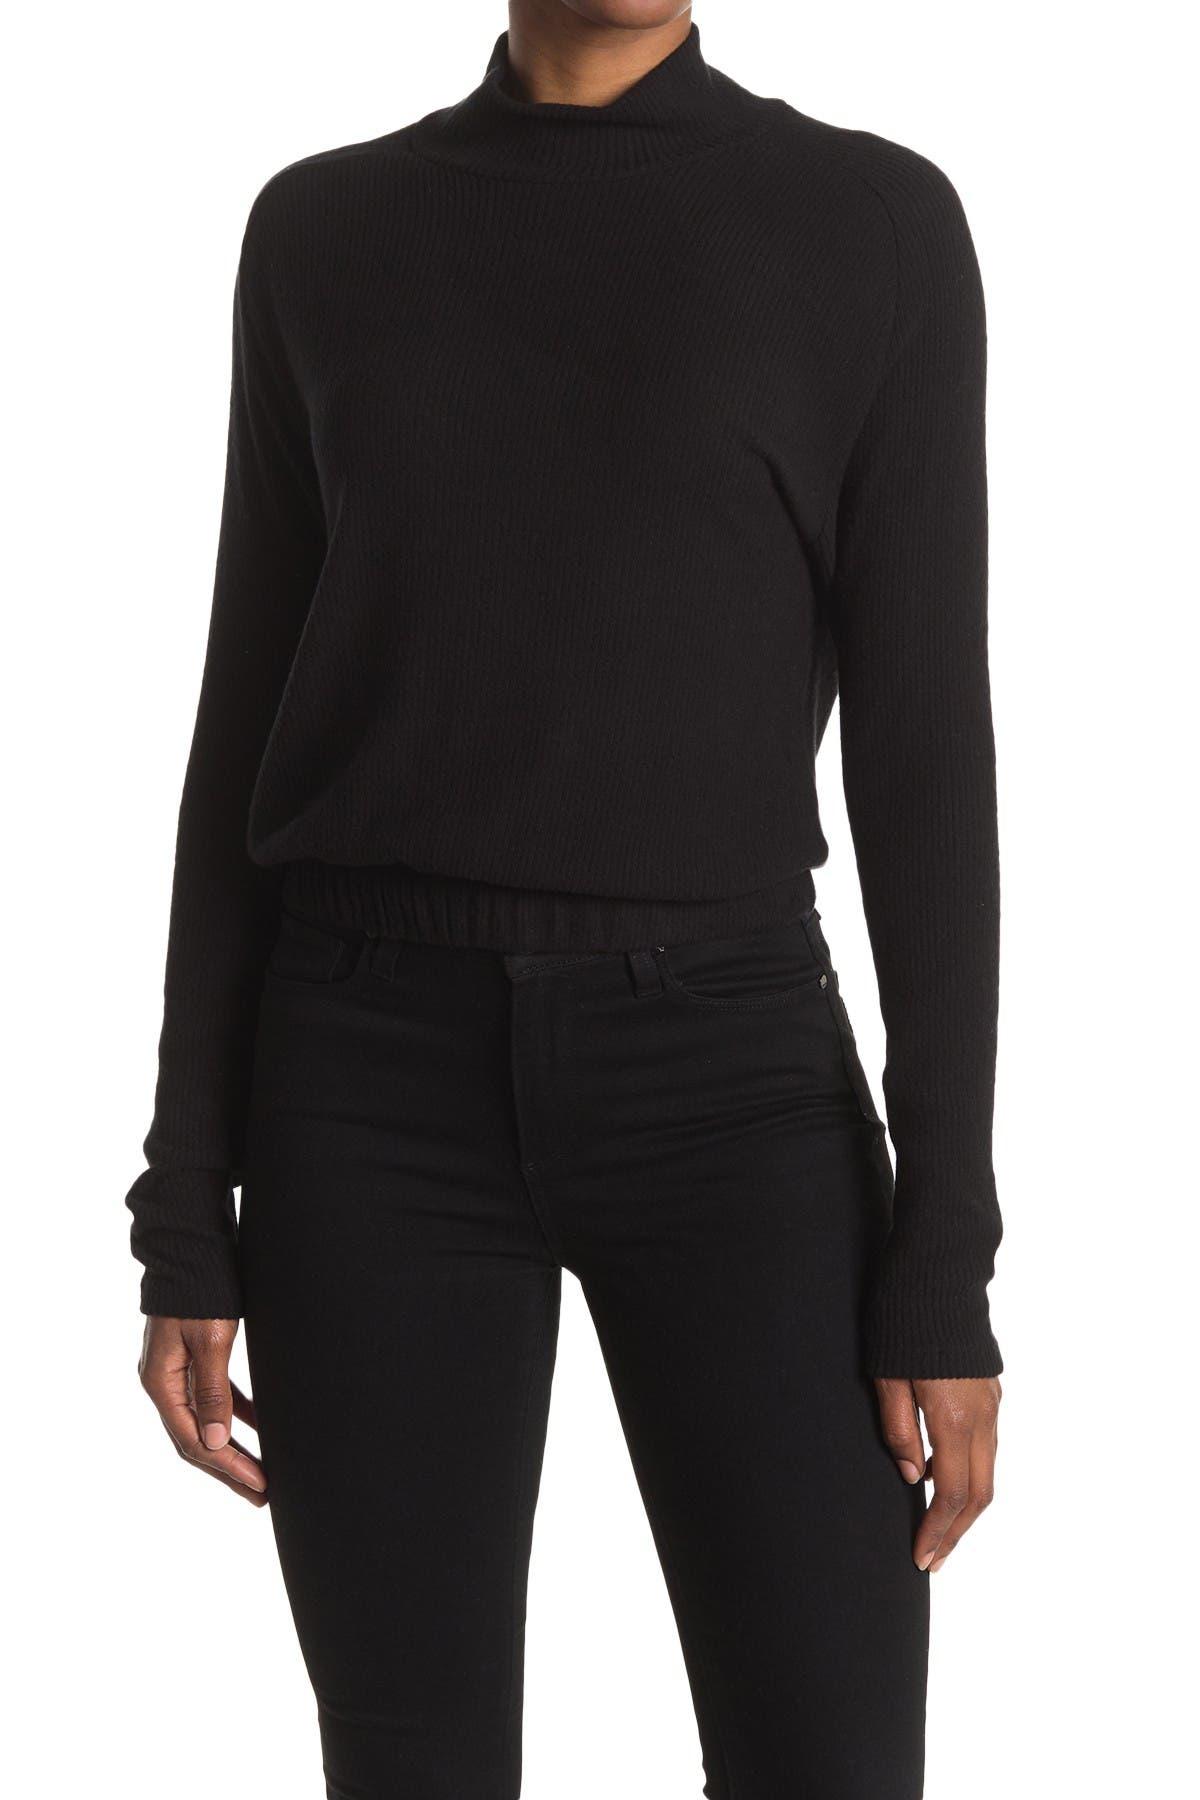 Image of LA LA LAND CREATIVE CO Brushed Mock Neck Pullover Sweater